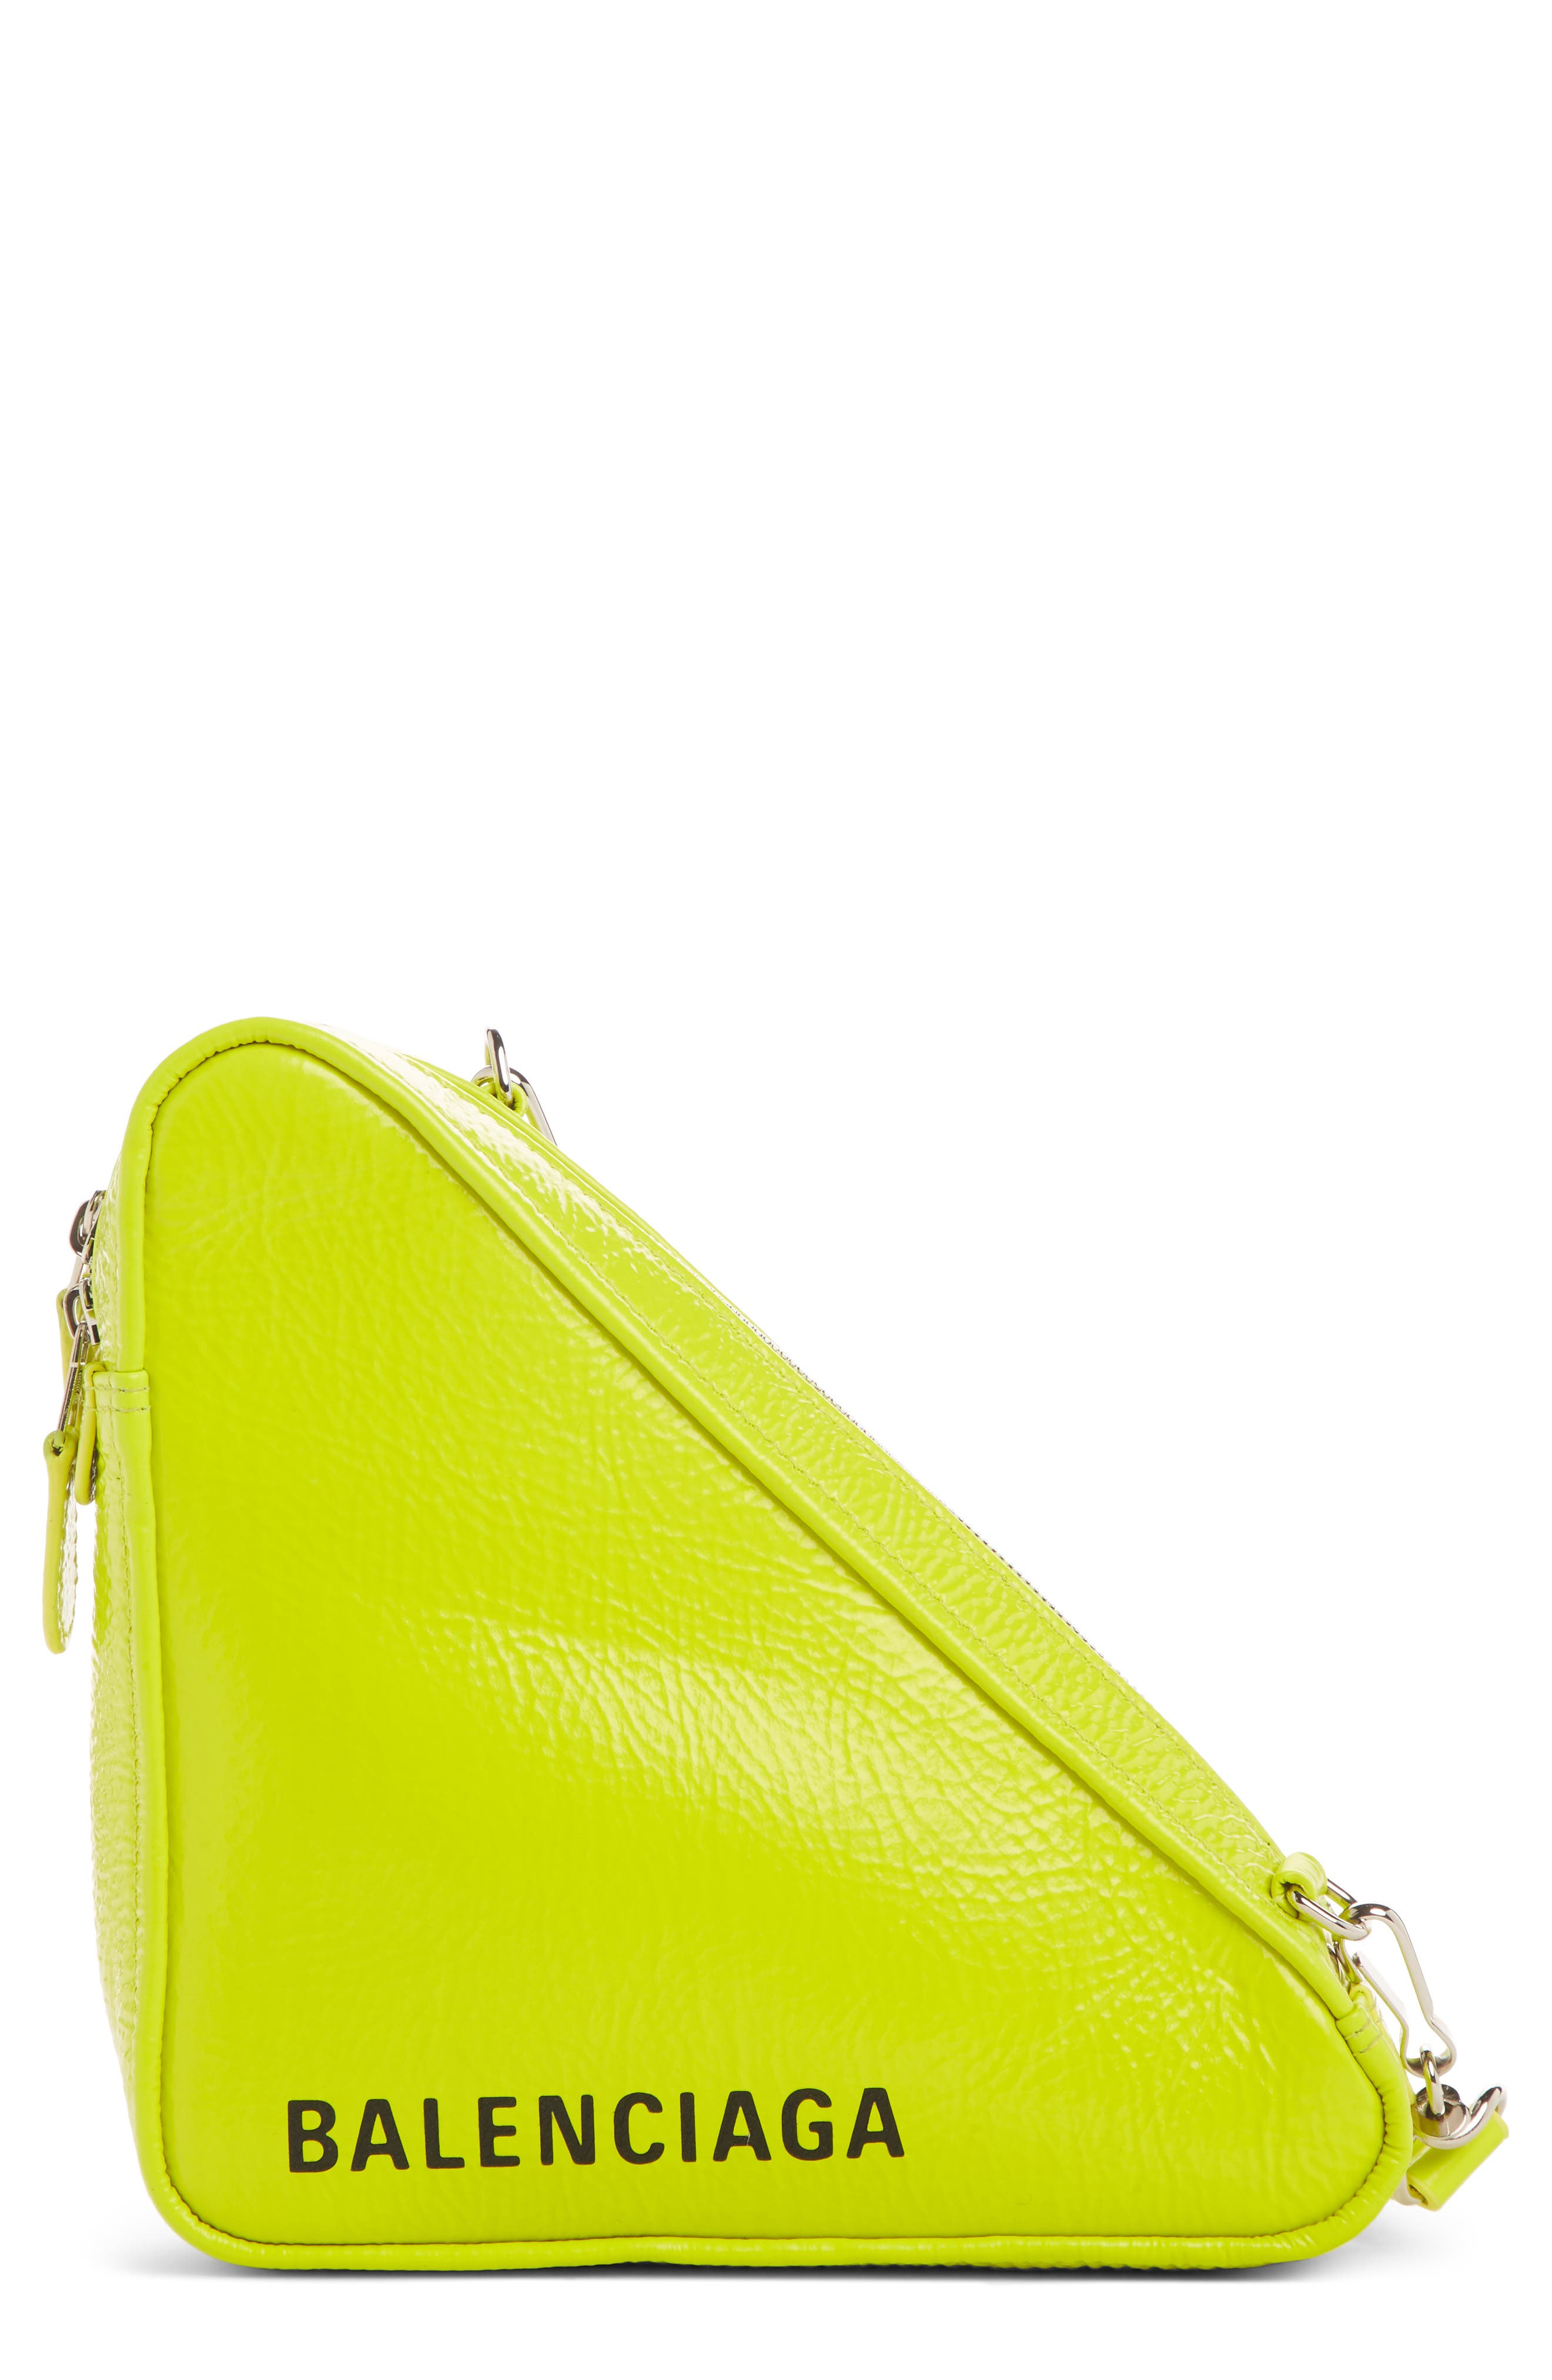 BALENCIAGA,                             Triangle Calfskin Crossbody Bag,                             Main thumbnail 1, color,                             ACID GREEN/ BLACK